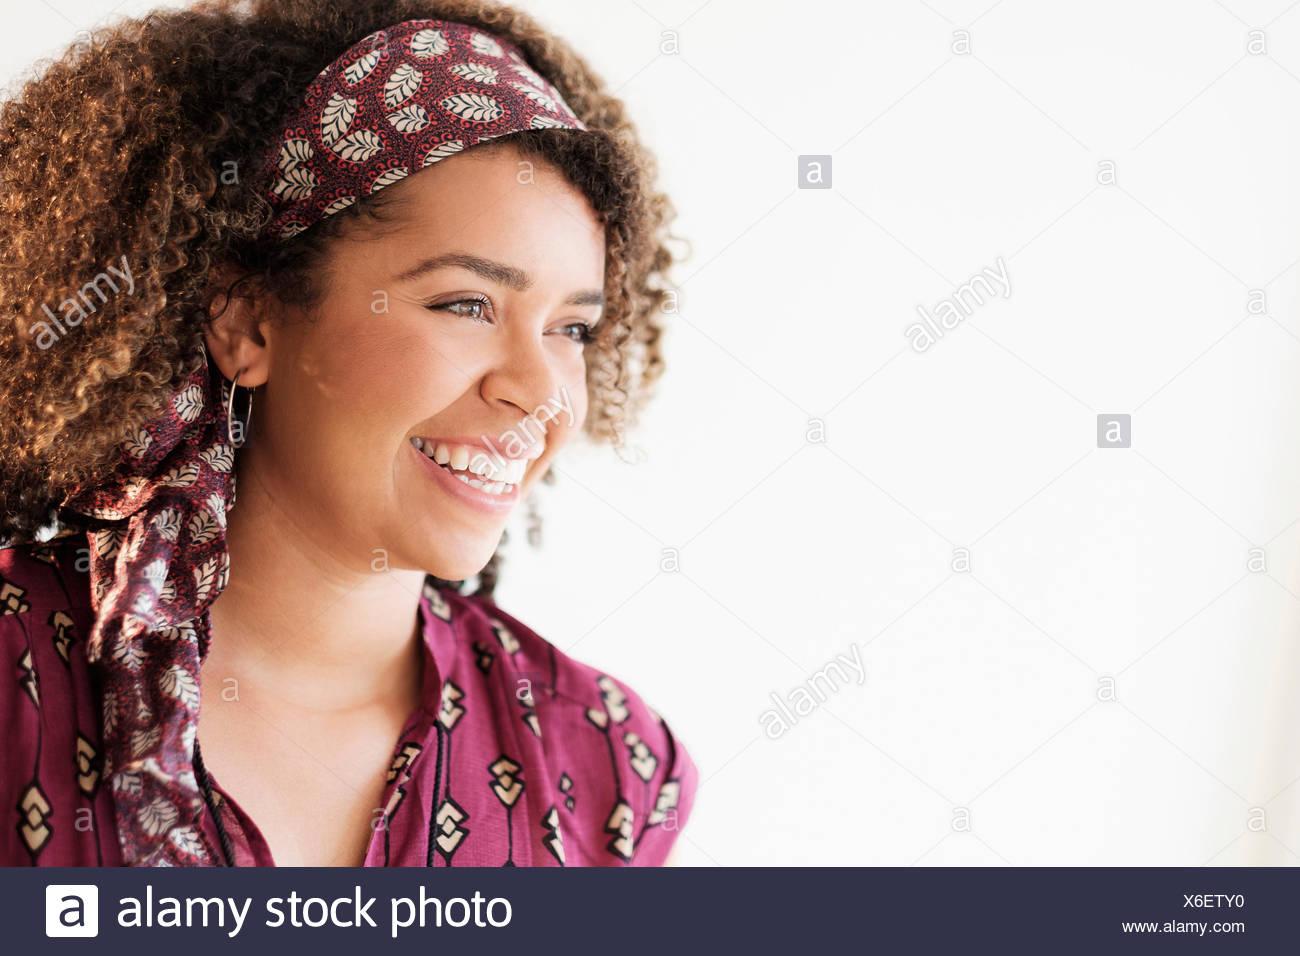 Porträt der lächelnde Frau mit lockigem Haar Stockbild